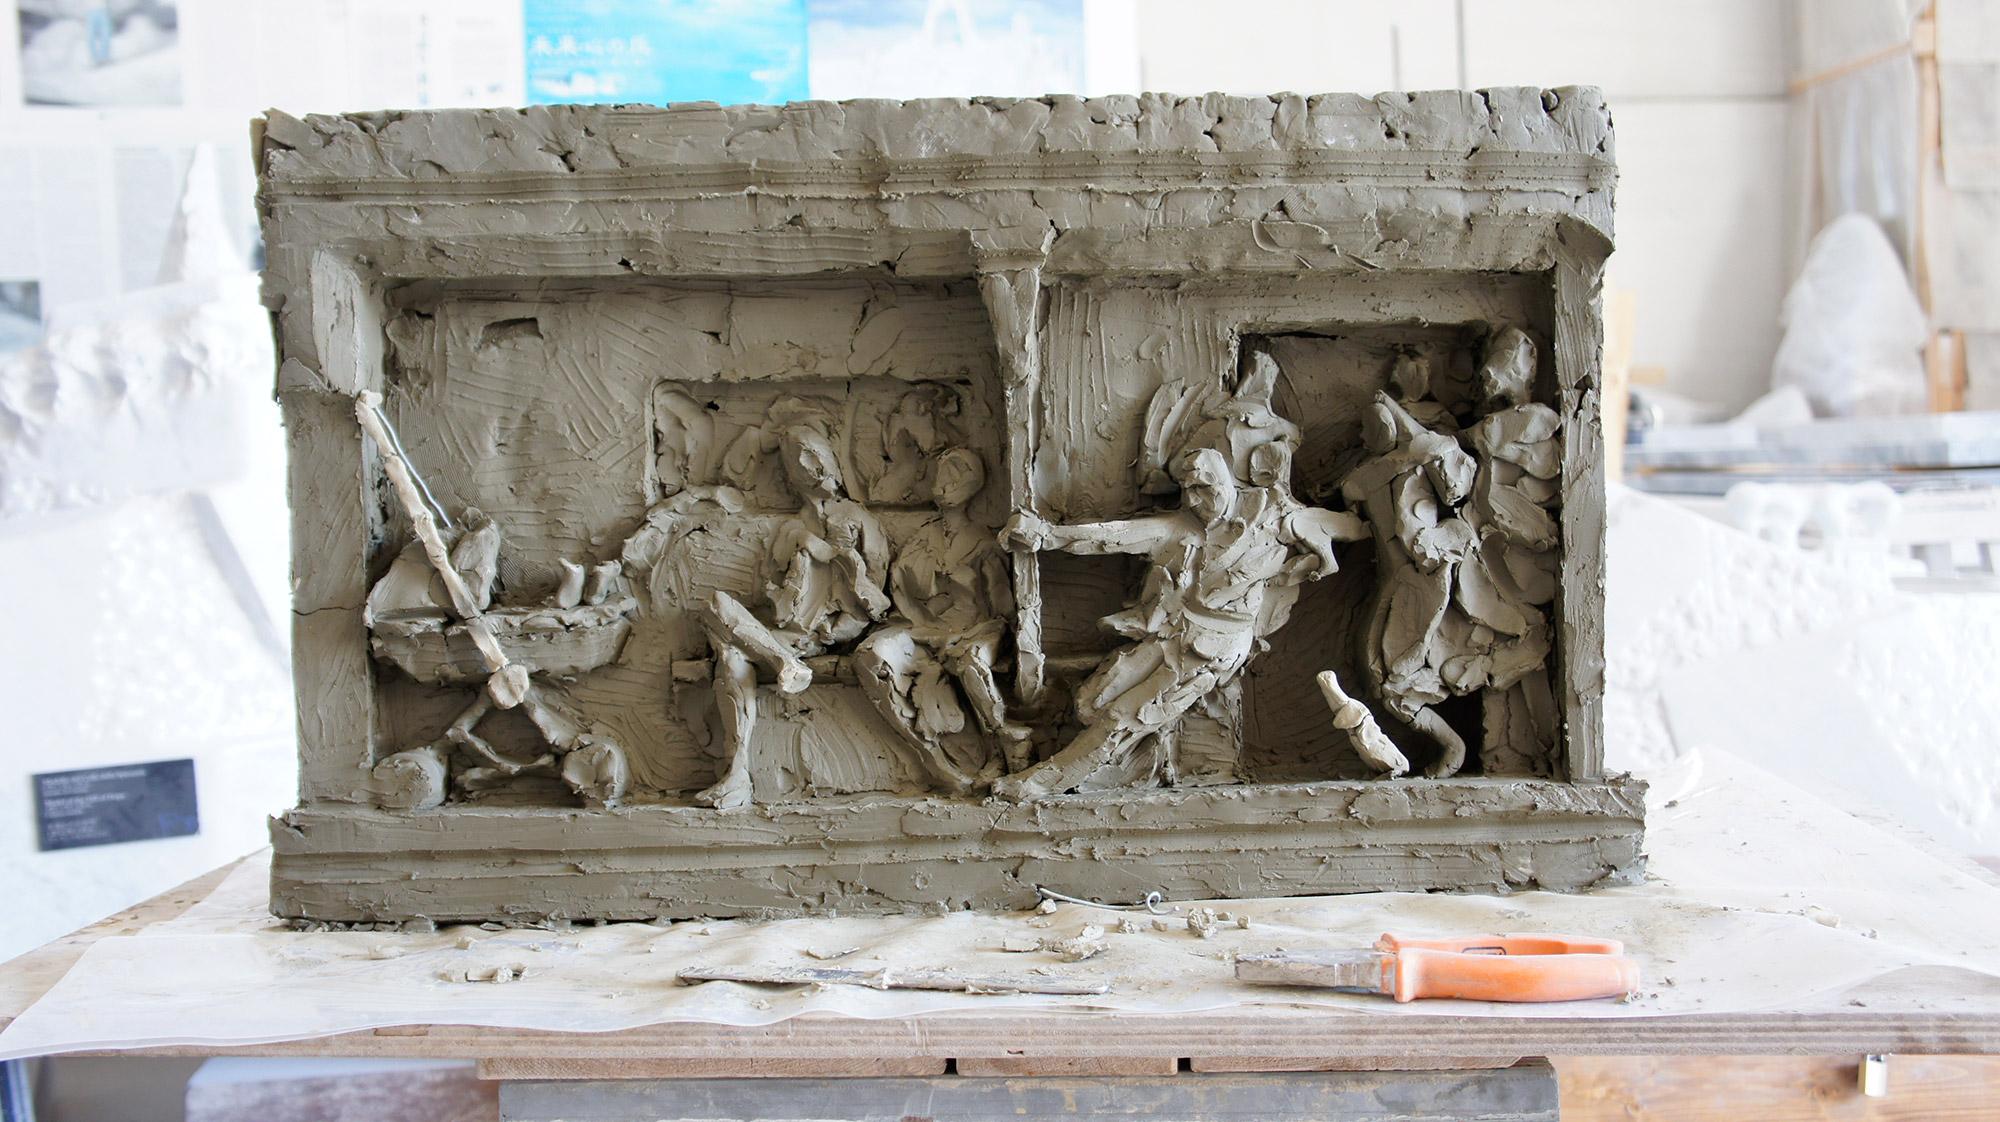 New-York-Academy-of-Art-Carrara-Residency-Brice-Esso-Jiannan-Wu20171213_0158.jpg